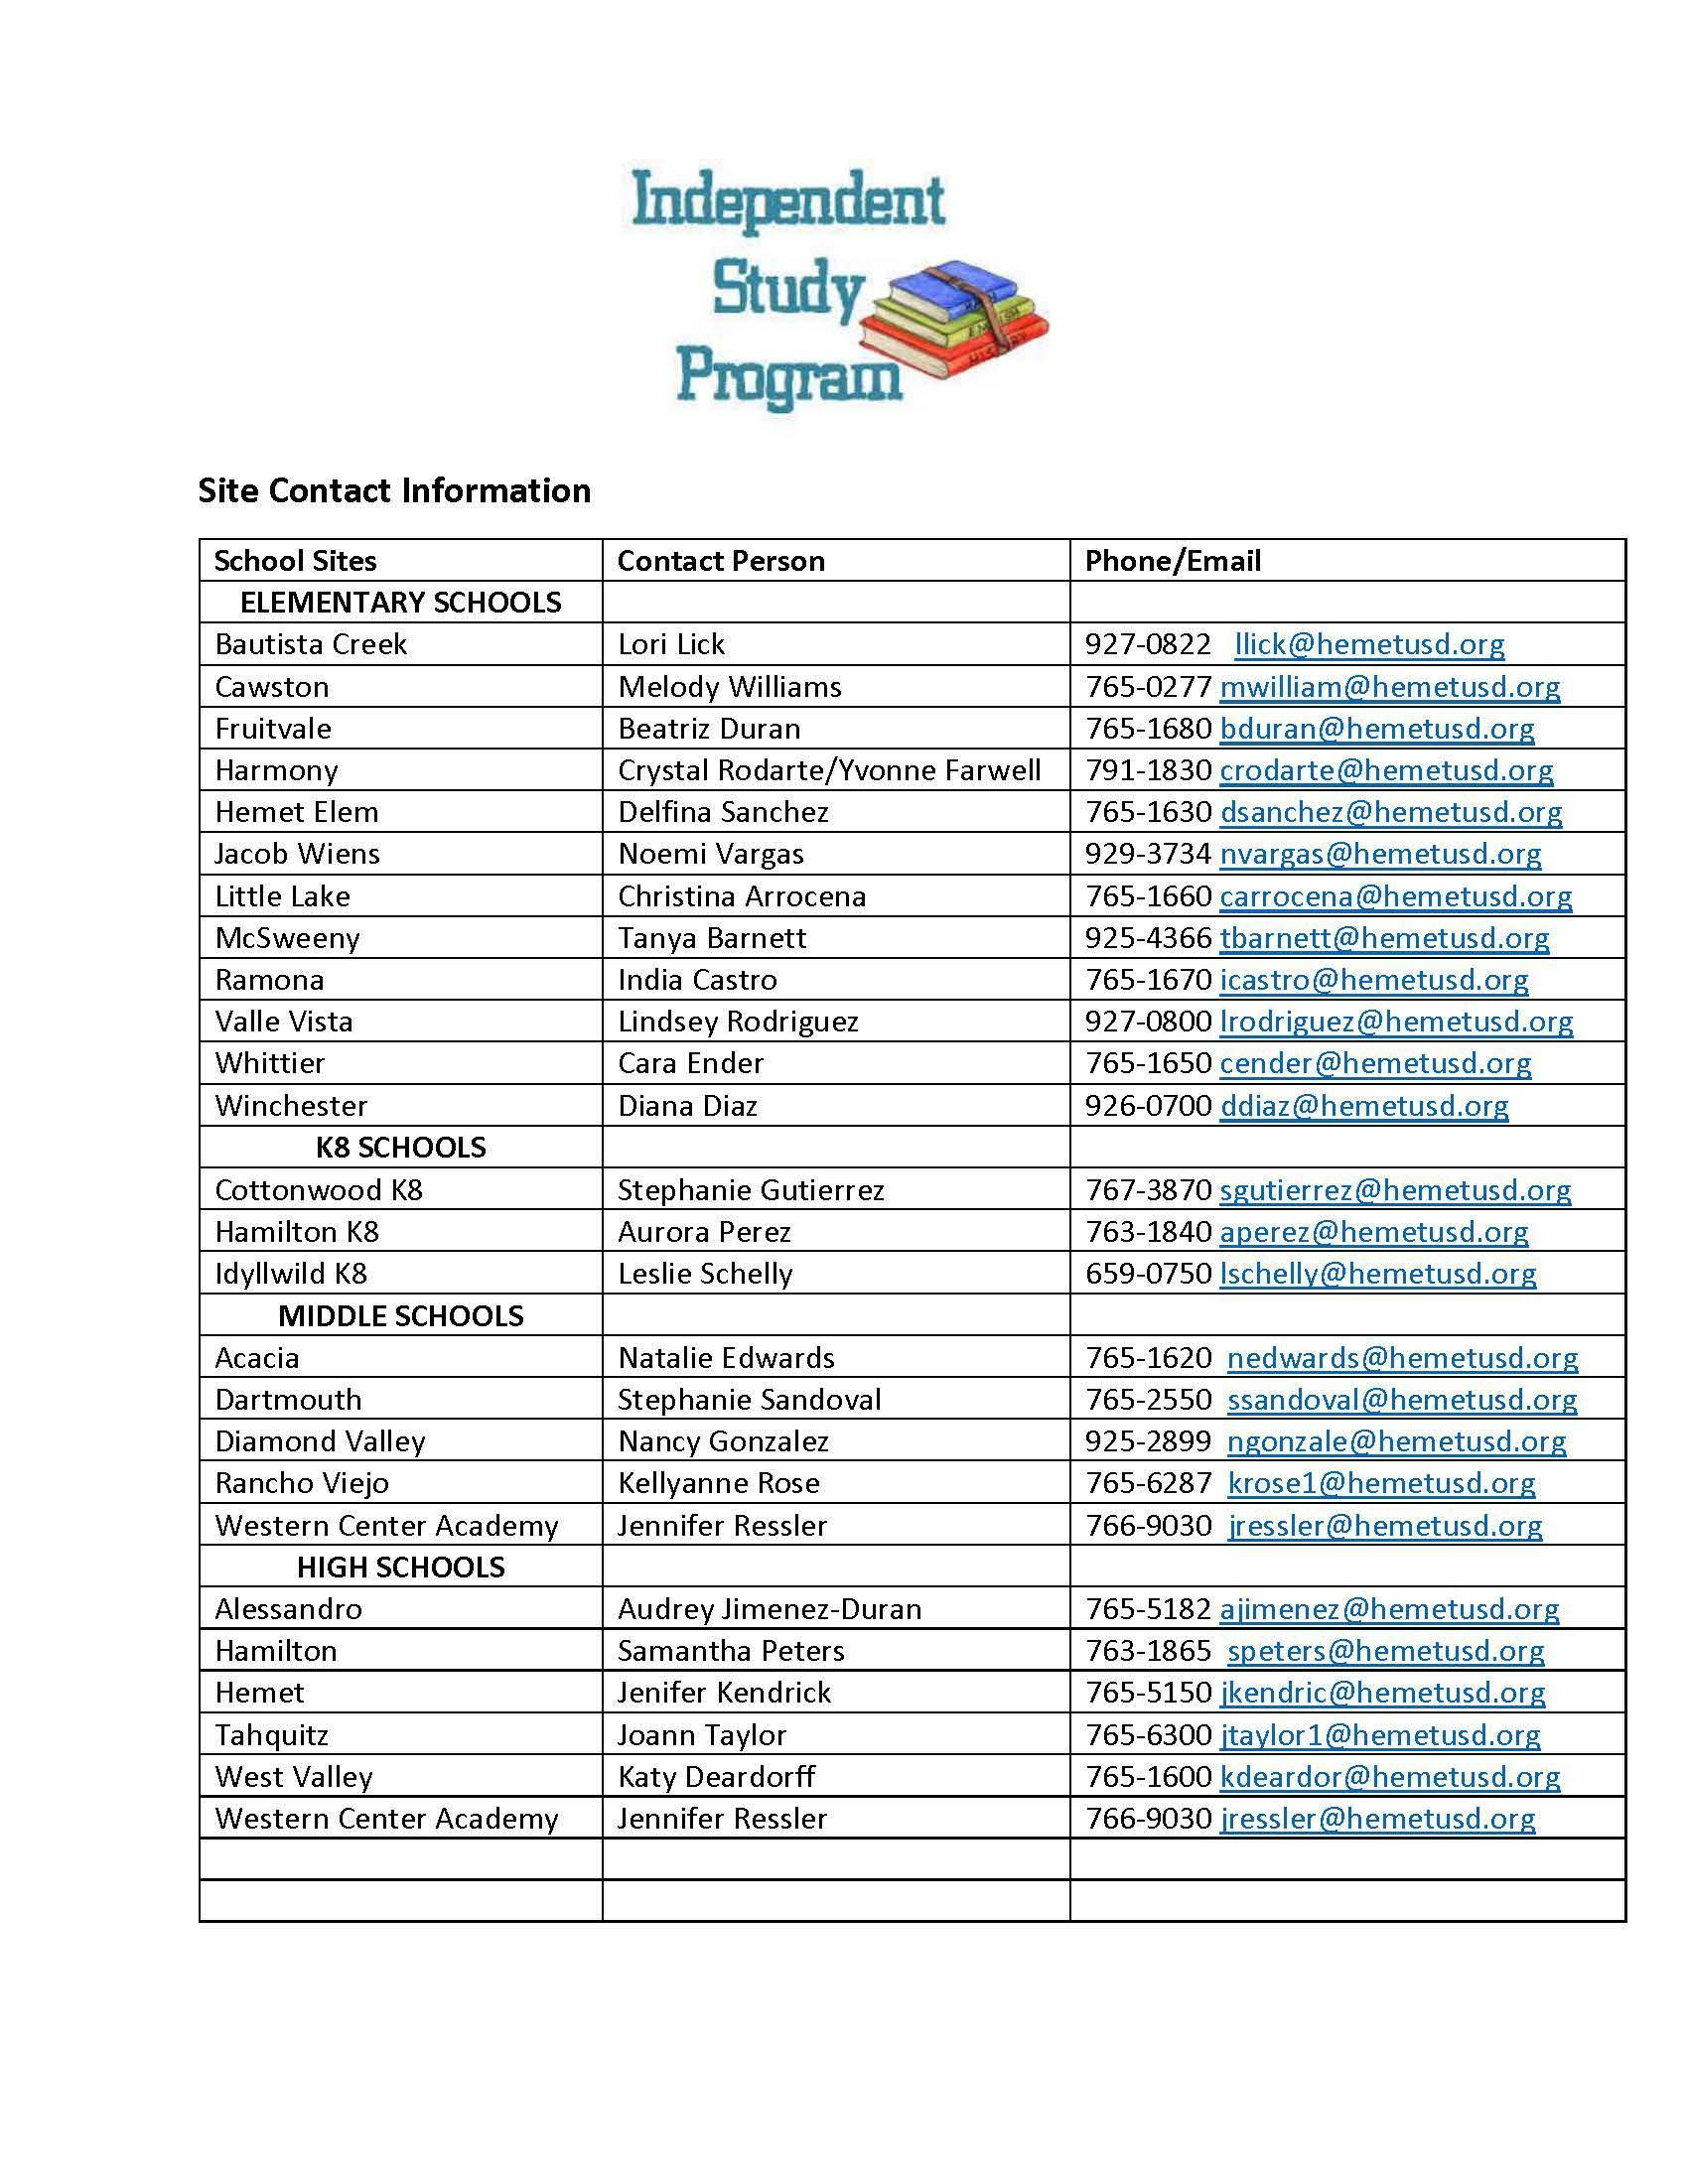 19-20 IDS Program Contacts